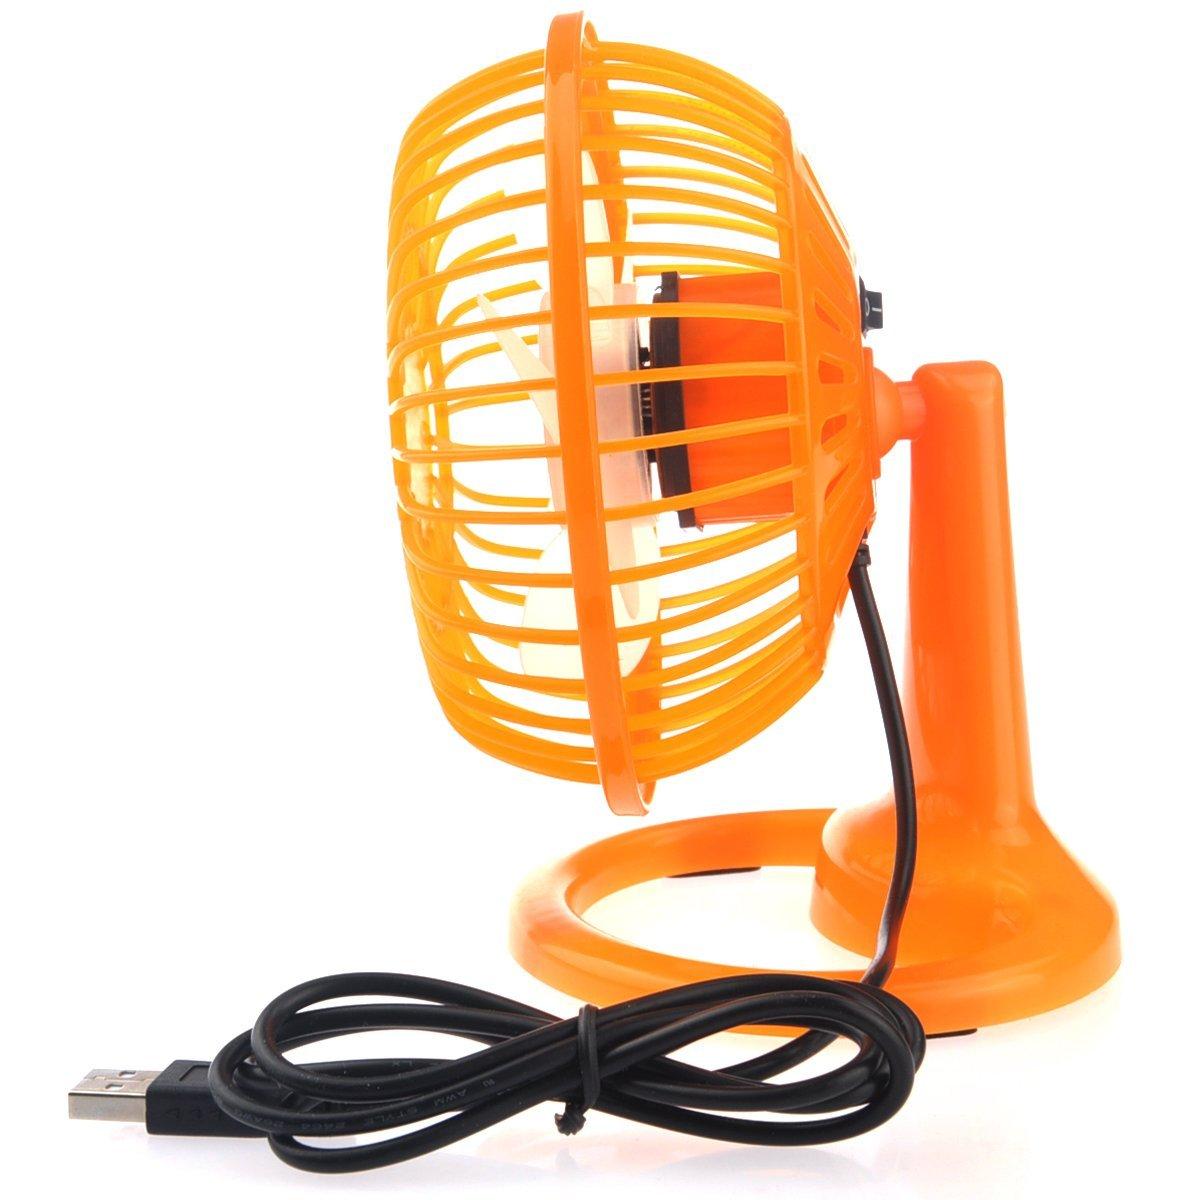 Bangcool Mini Fan Innovative Battery USB Power 360 Degree Adjustable